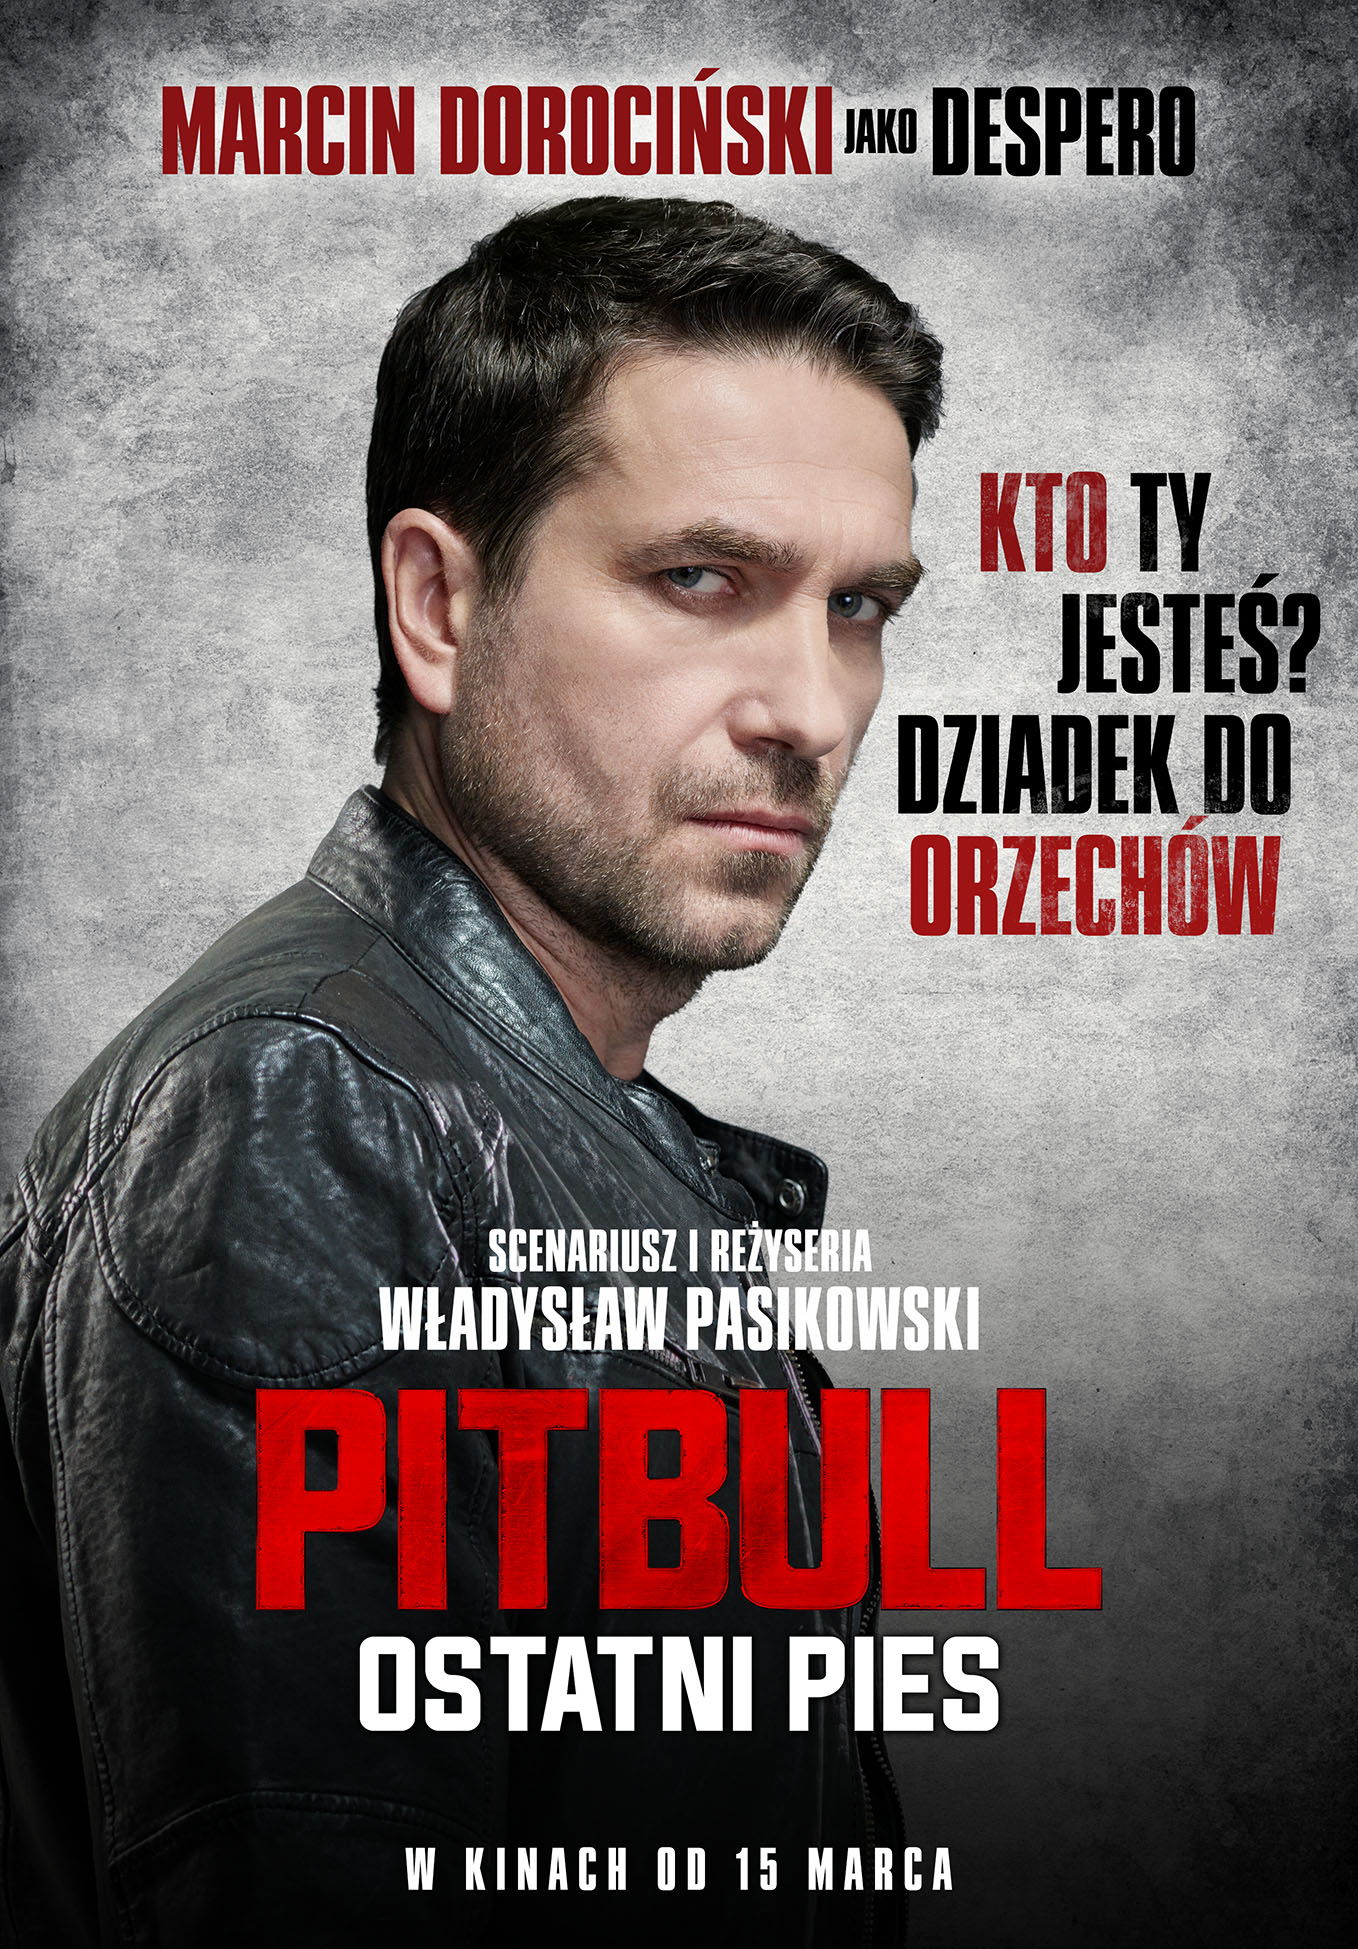 Marcin Dorociński Pitbull Ostatni Pies